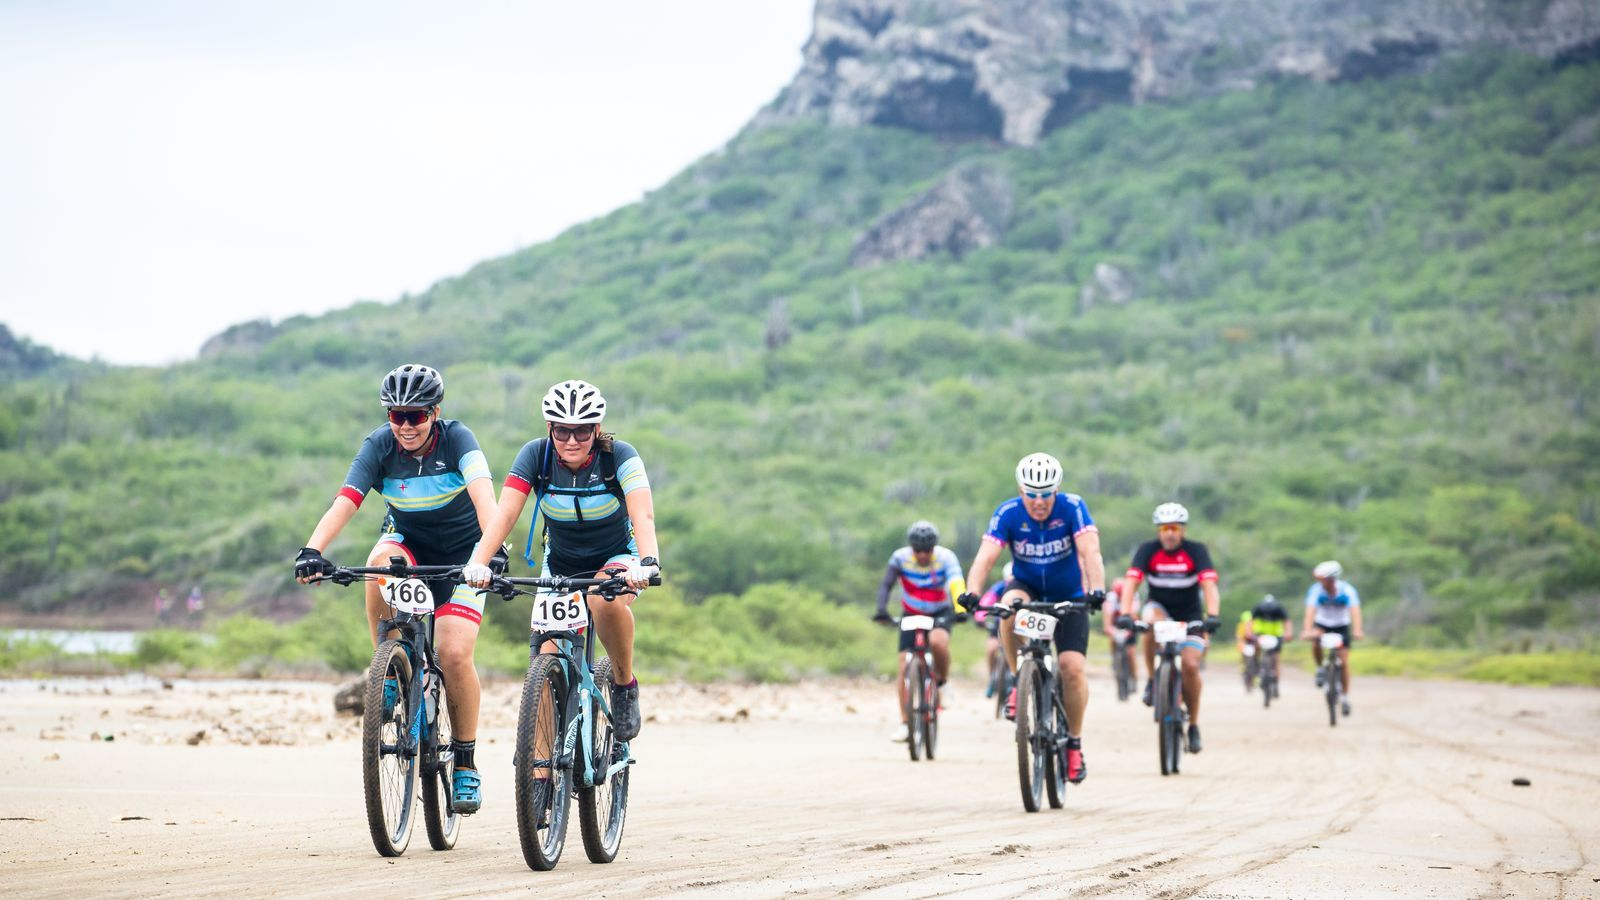 Curaçao Cycling Weekend - 3 nights